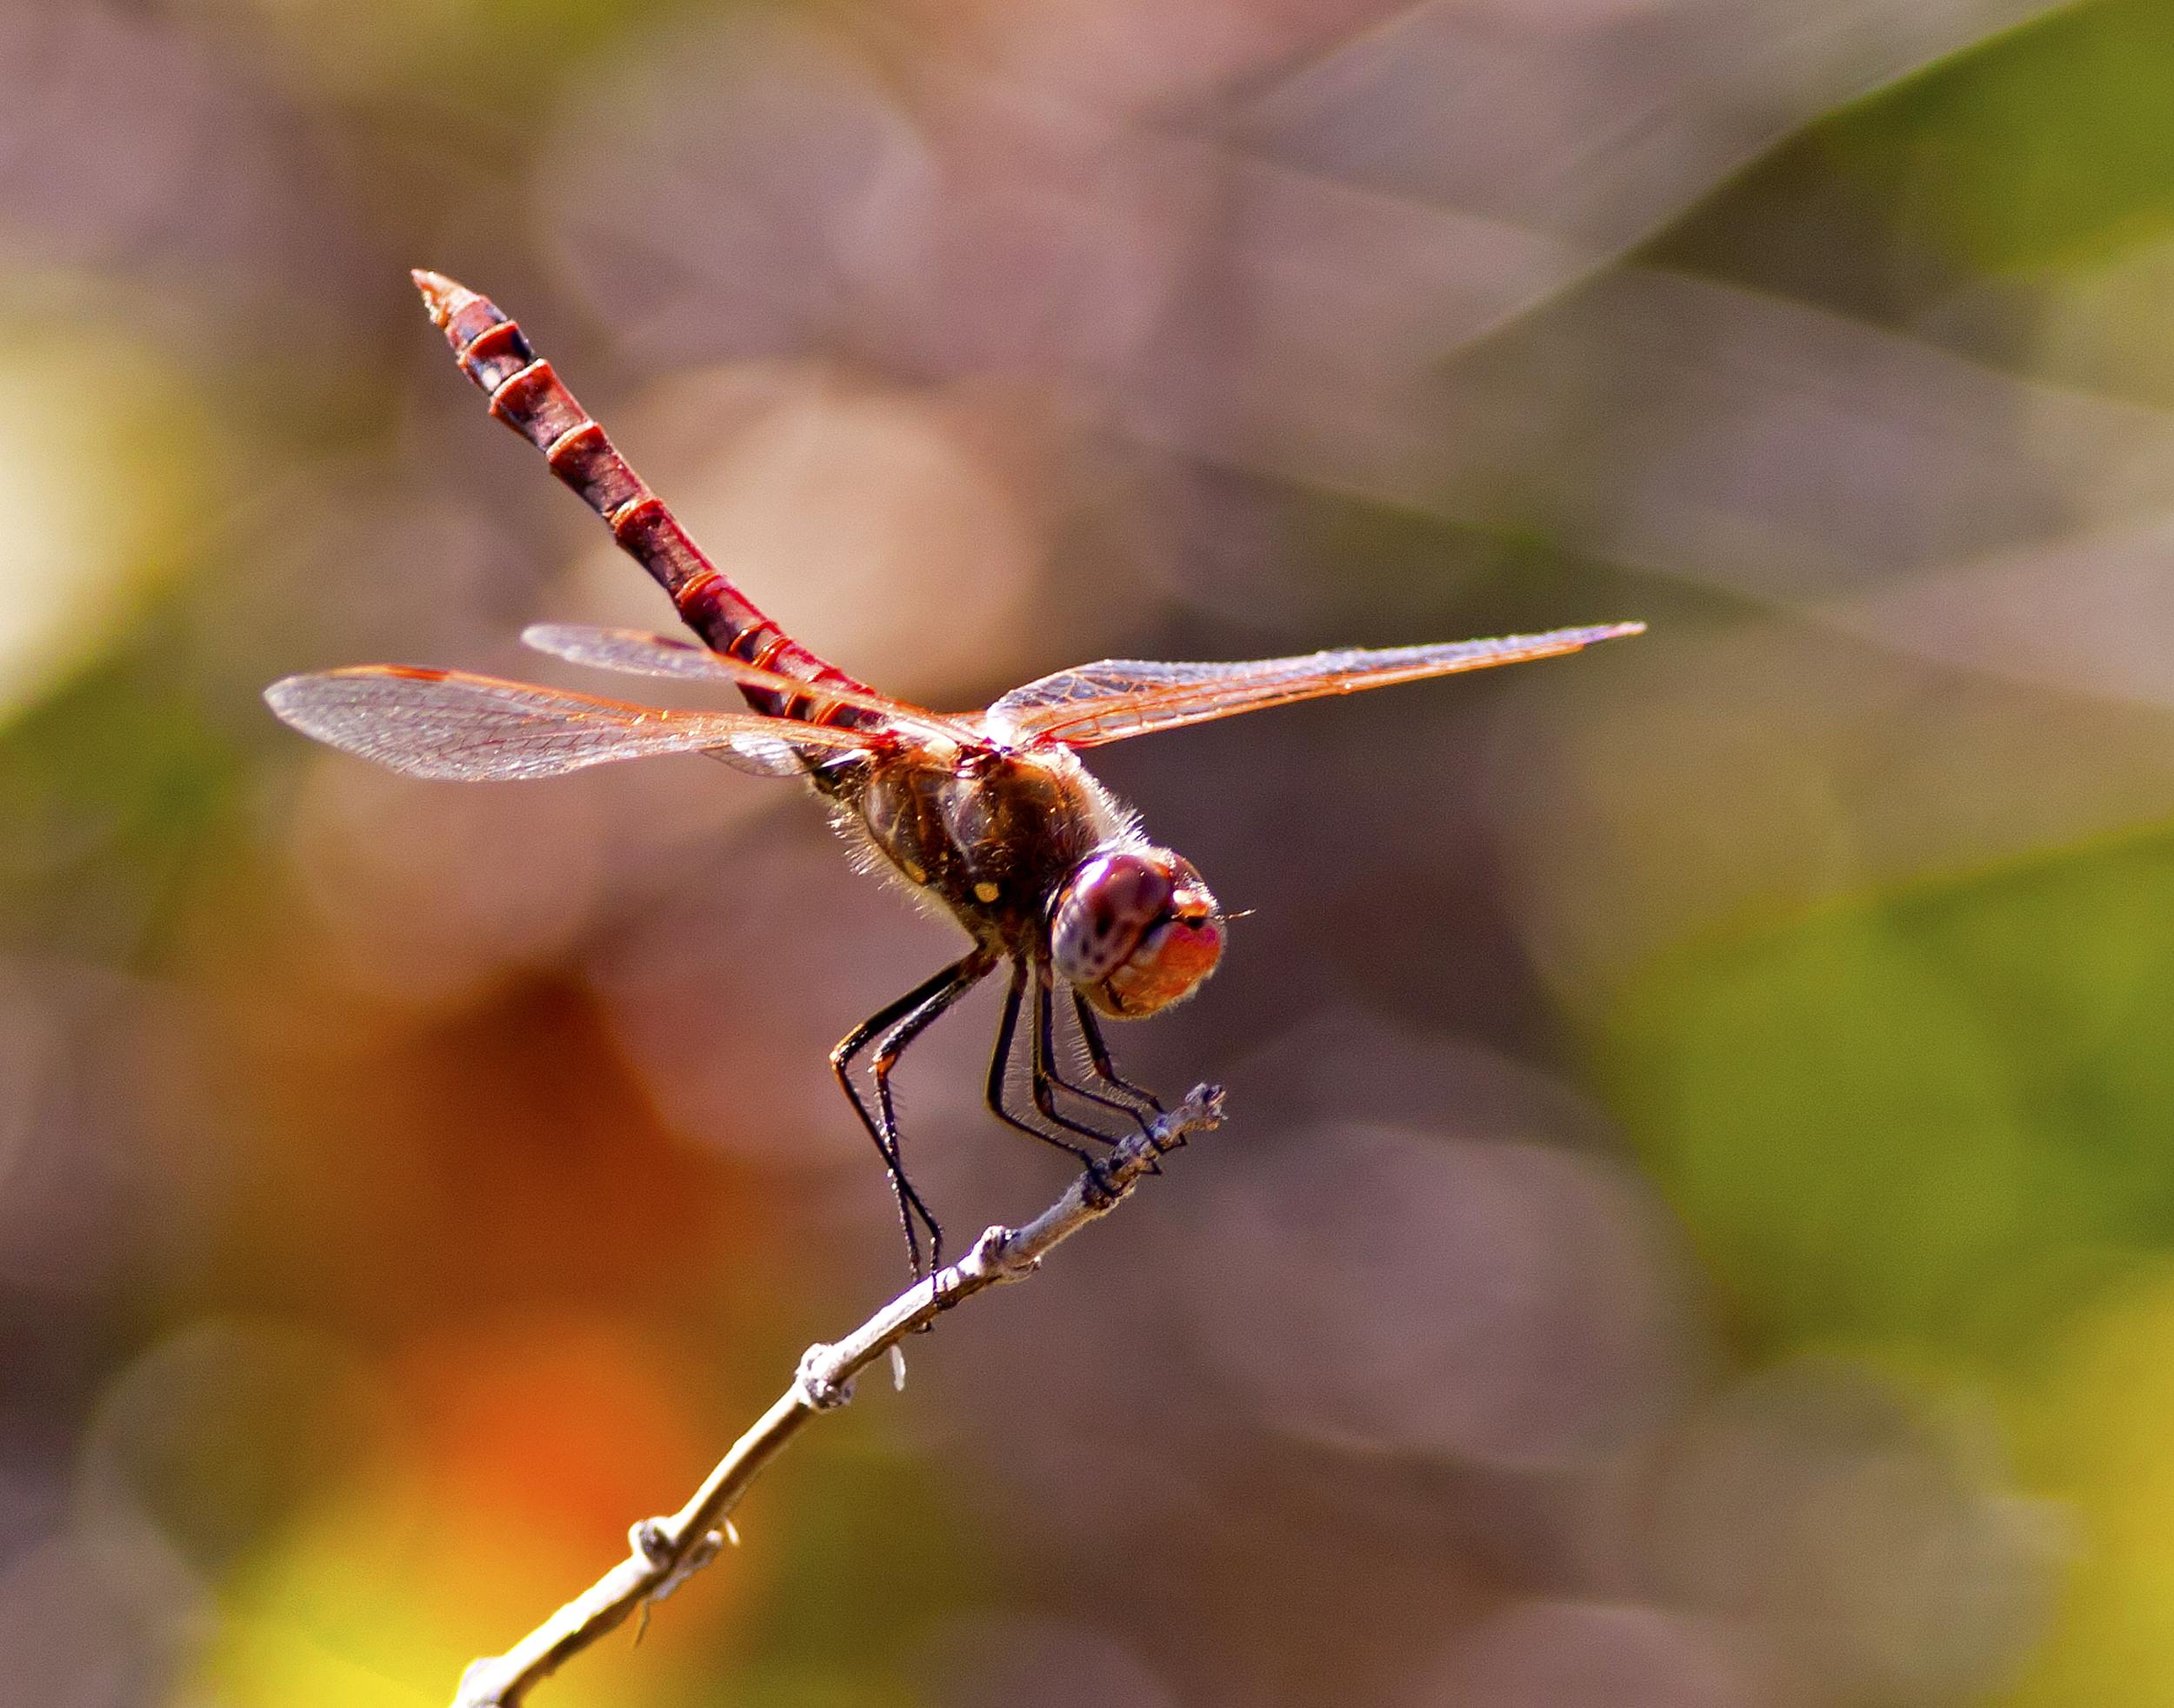 69 - Dragonfly